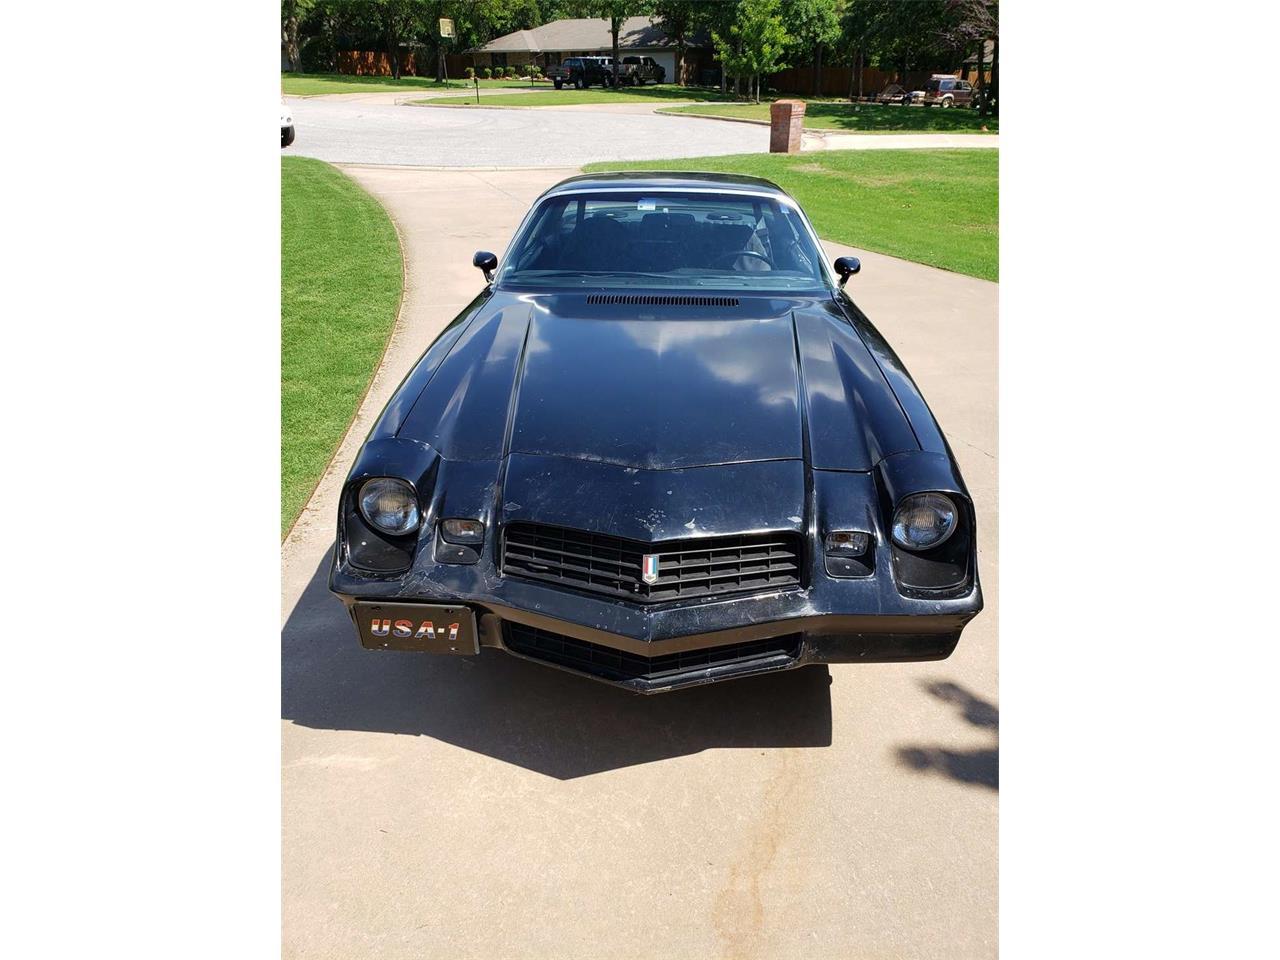 Large Picture of '78 Camaro located in Oklahoma - $17,500.00 - QADZ